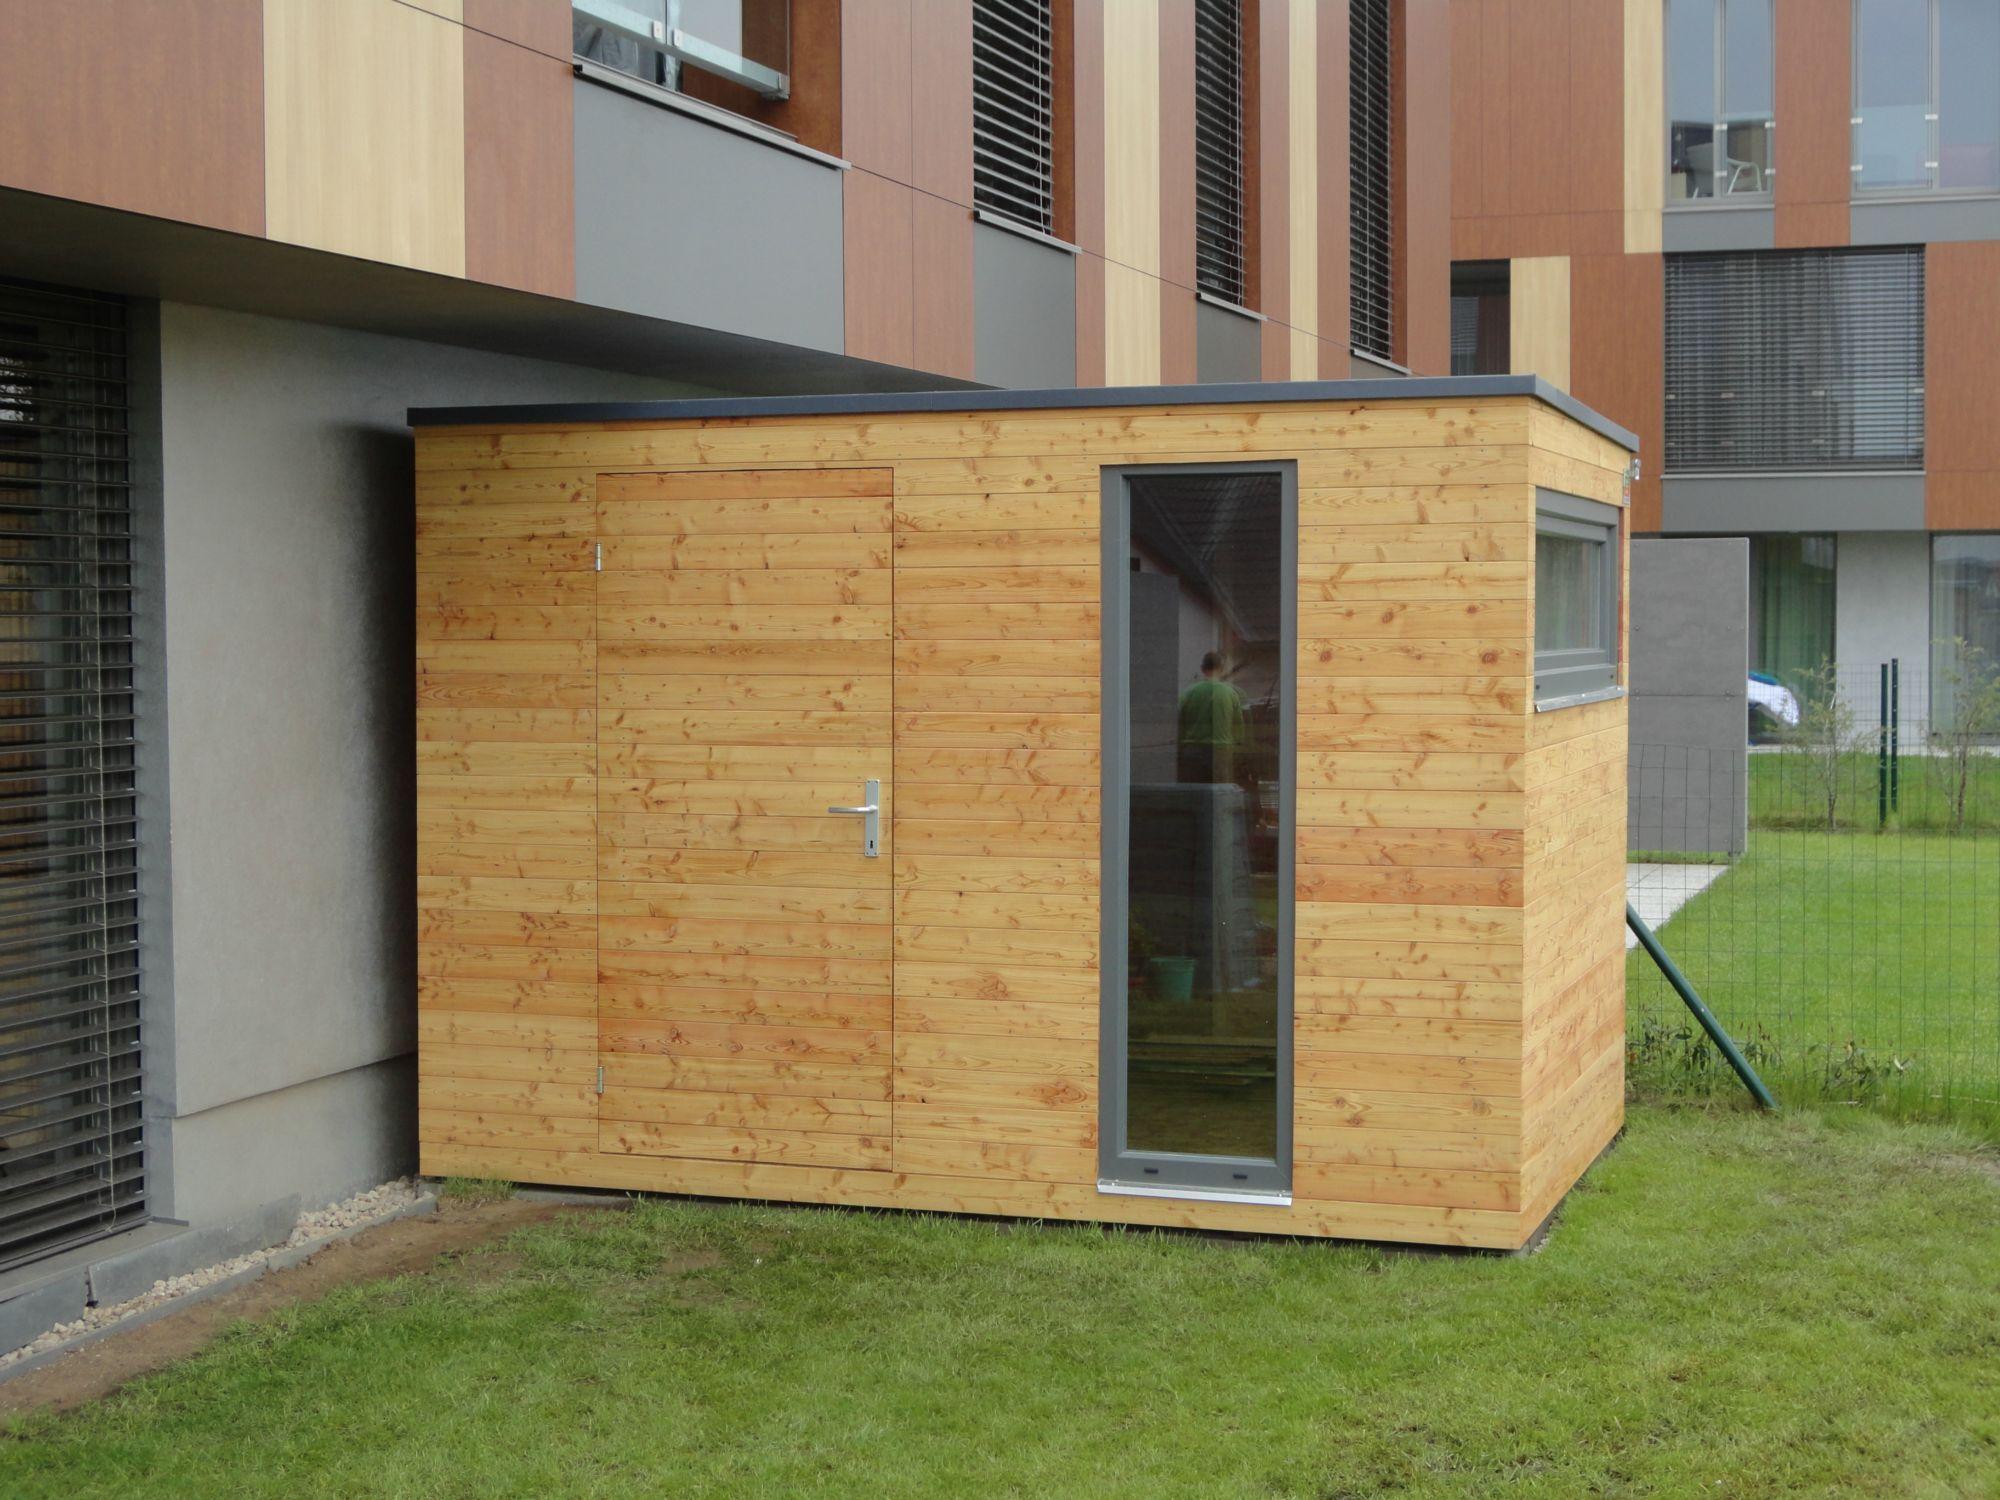 Gerätehaus 4x2 m Gartenhaus holz, Gartenhaus und Garten